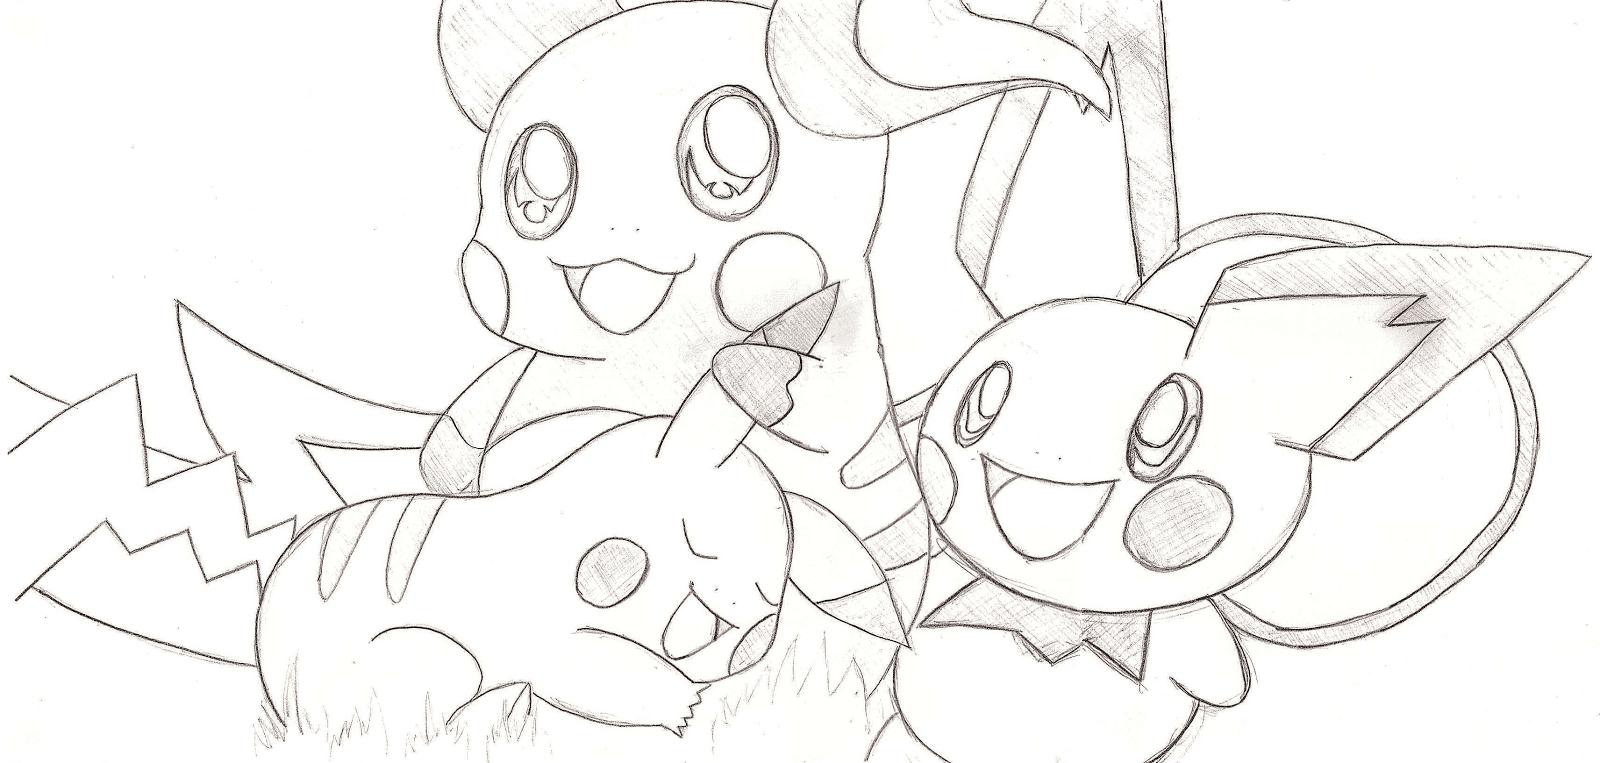 Tecanime cr ateca - Pokemon famille pikachu ...